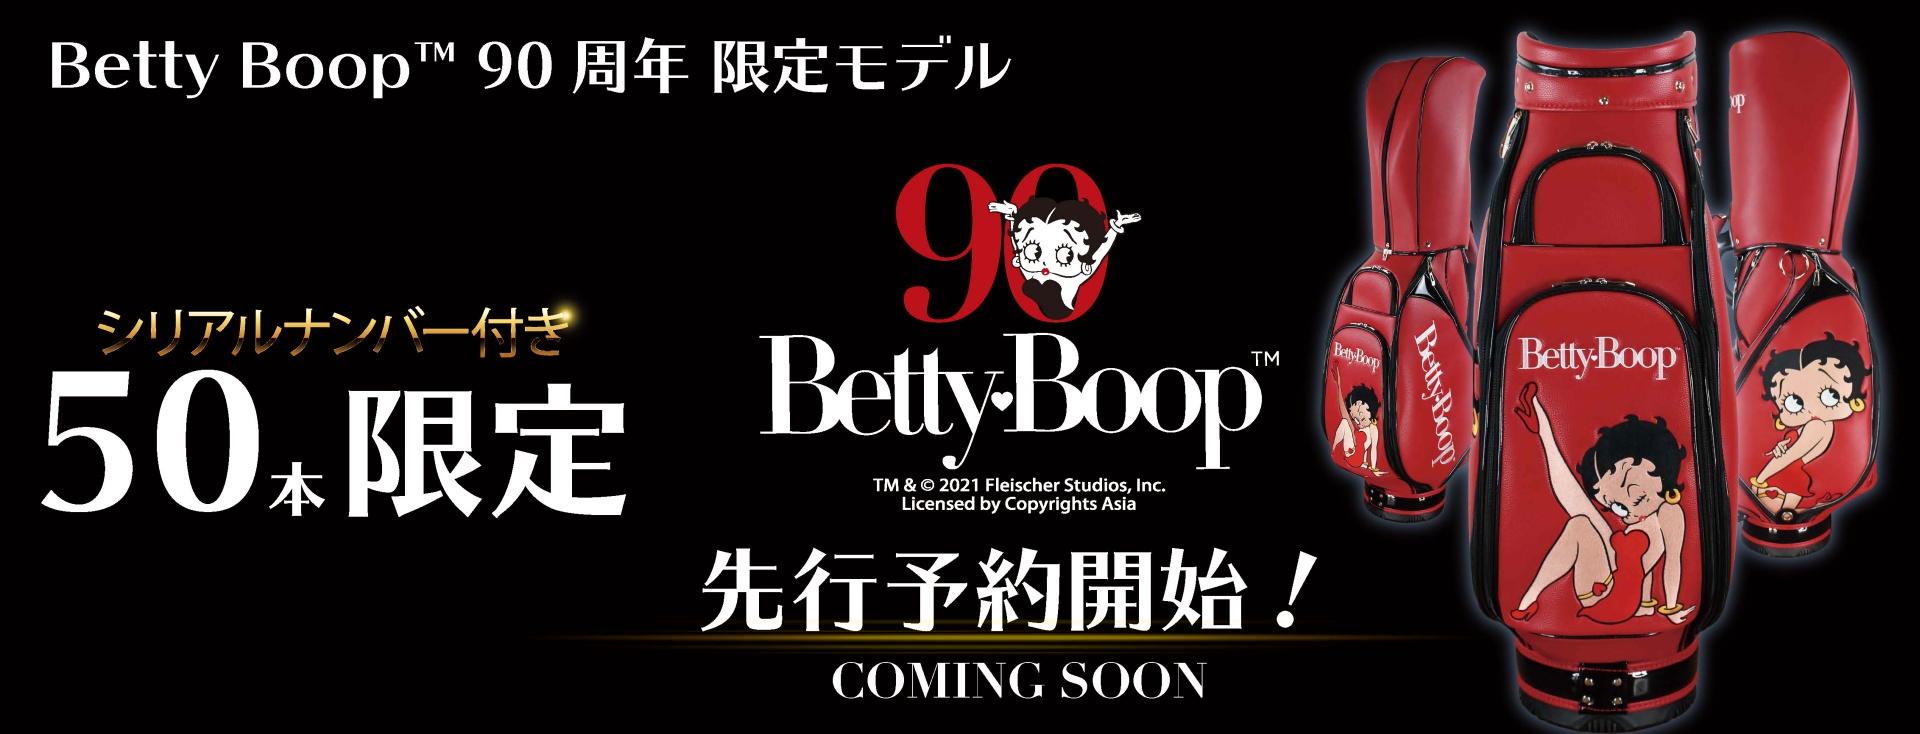 Betty Boop™ 50本限定生産 シリアルナンバープレートつき キャディバッグ